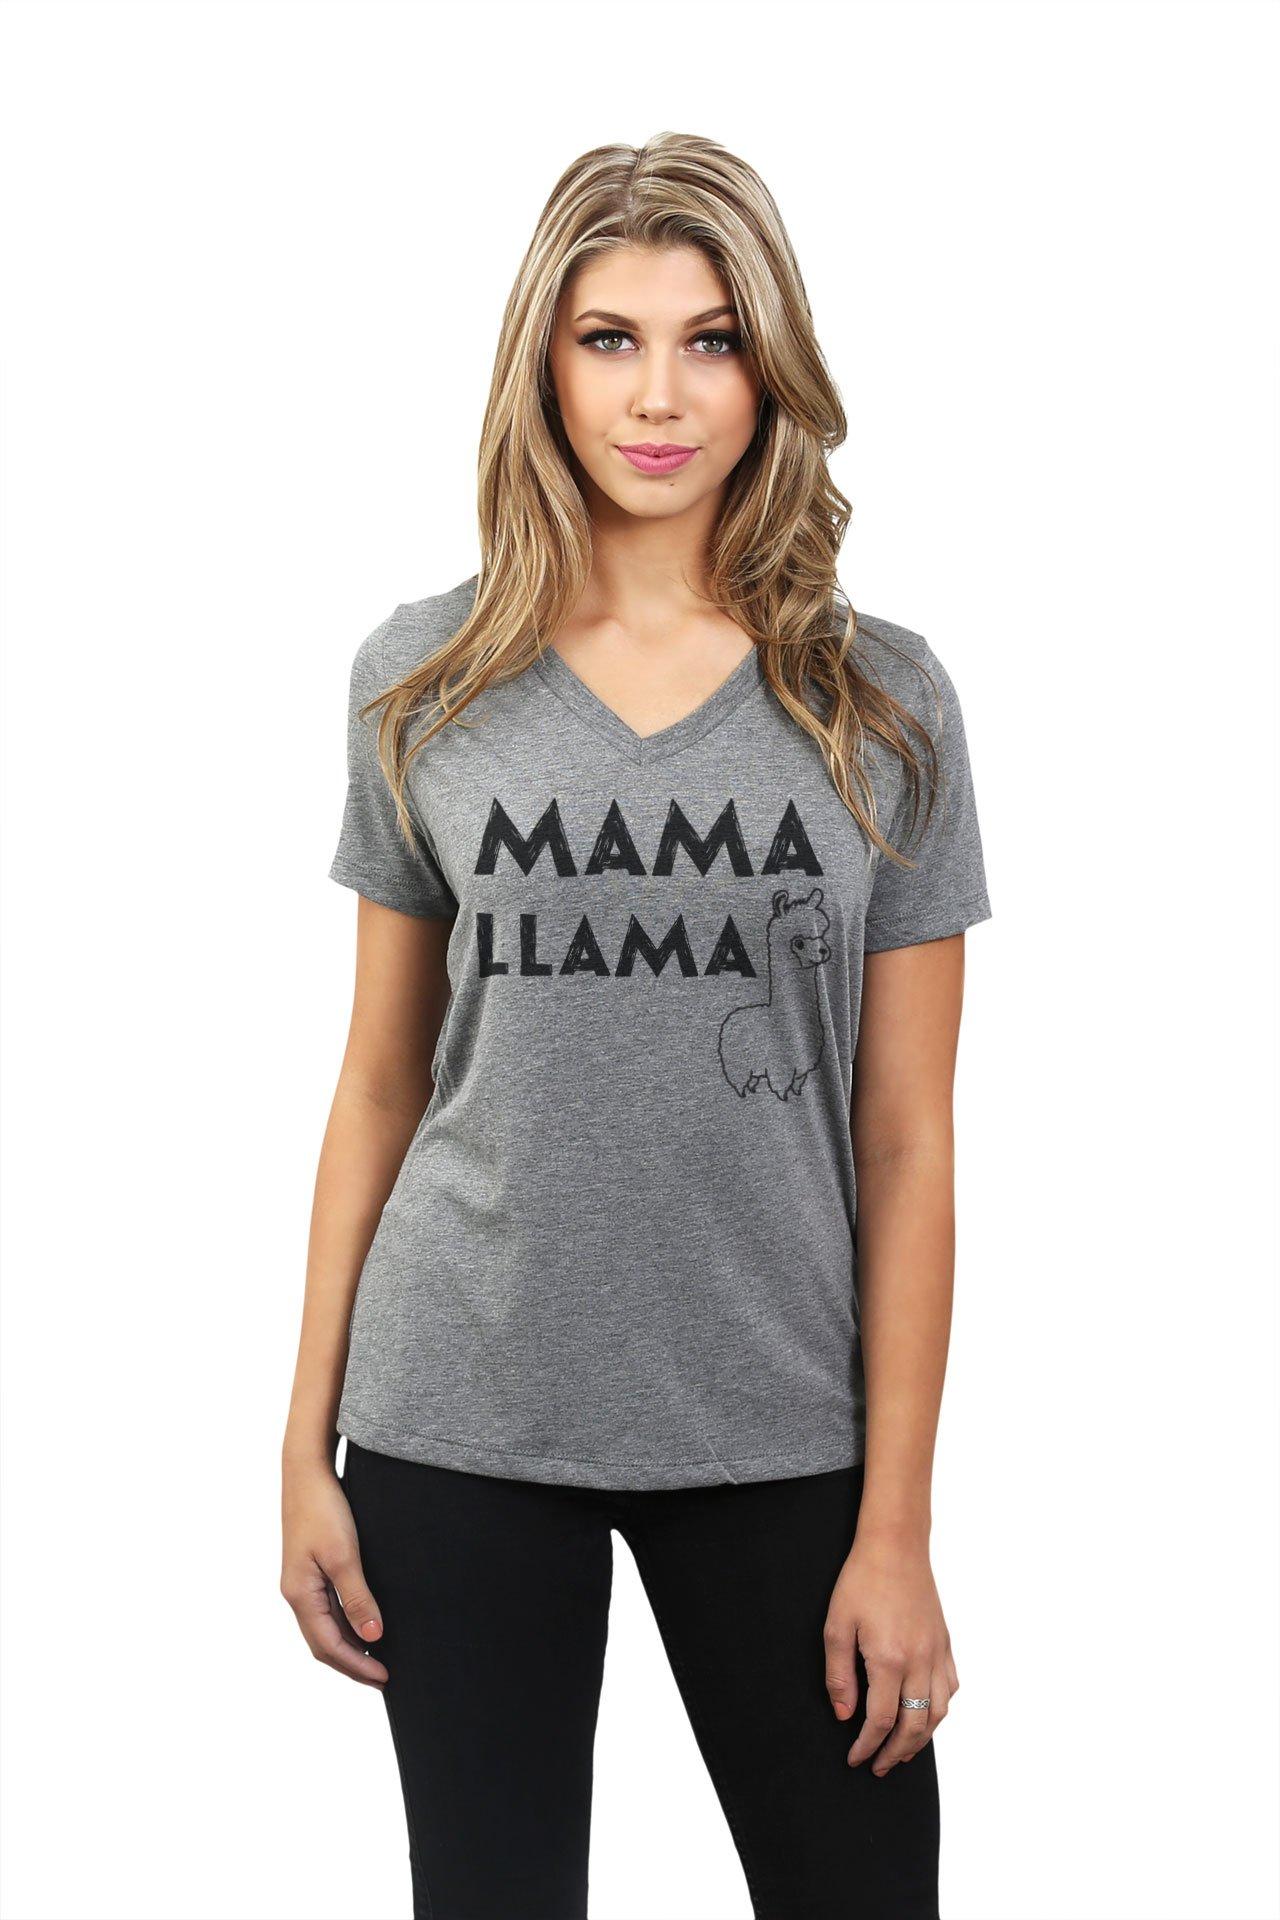 Mama Llama Women's Fashion Relaxed V-Neck T-Shirt Tee Heather Grey X-Large by Thread Tank (Image #2)